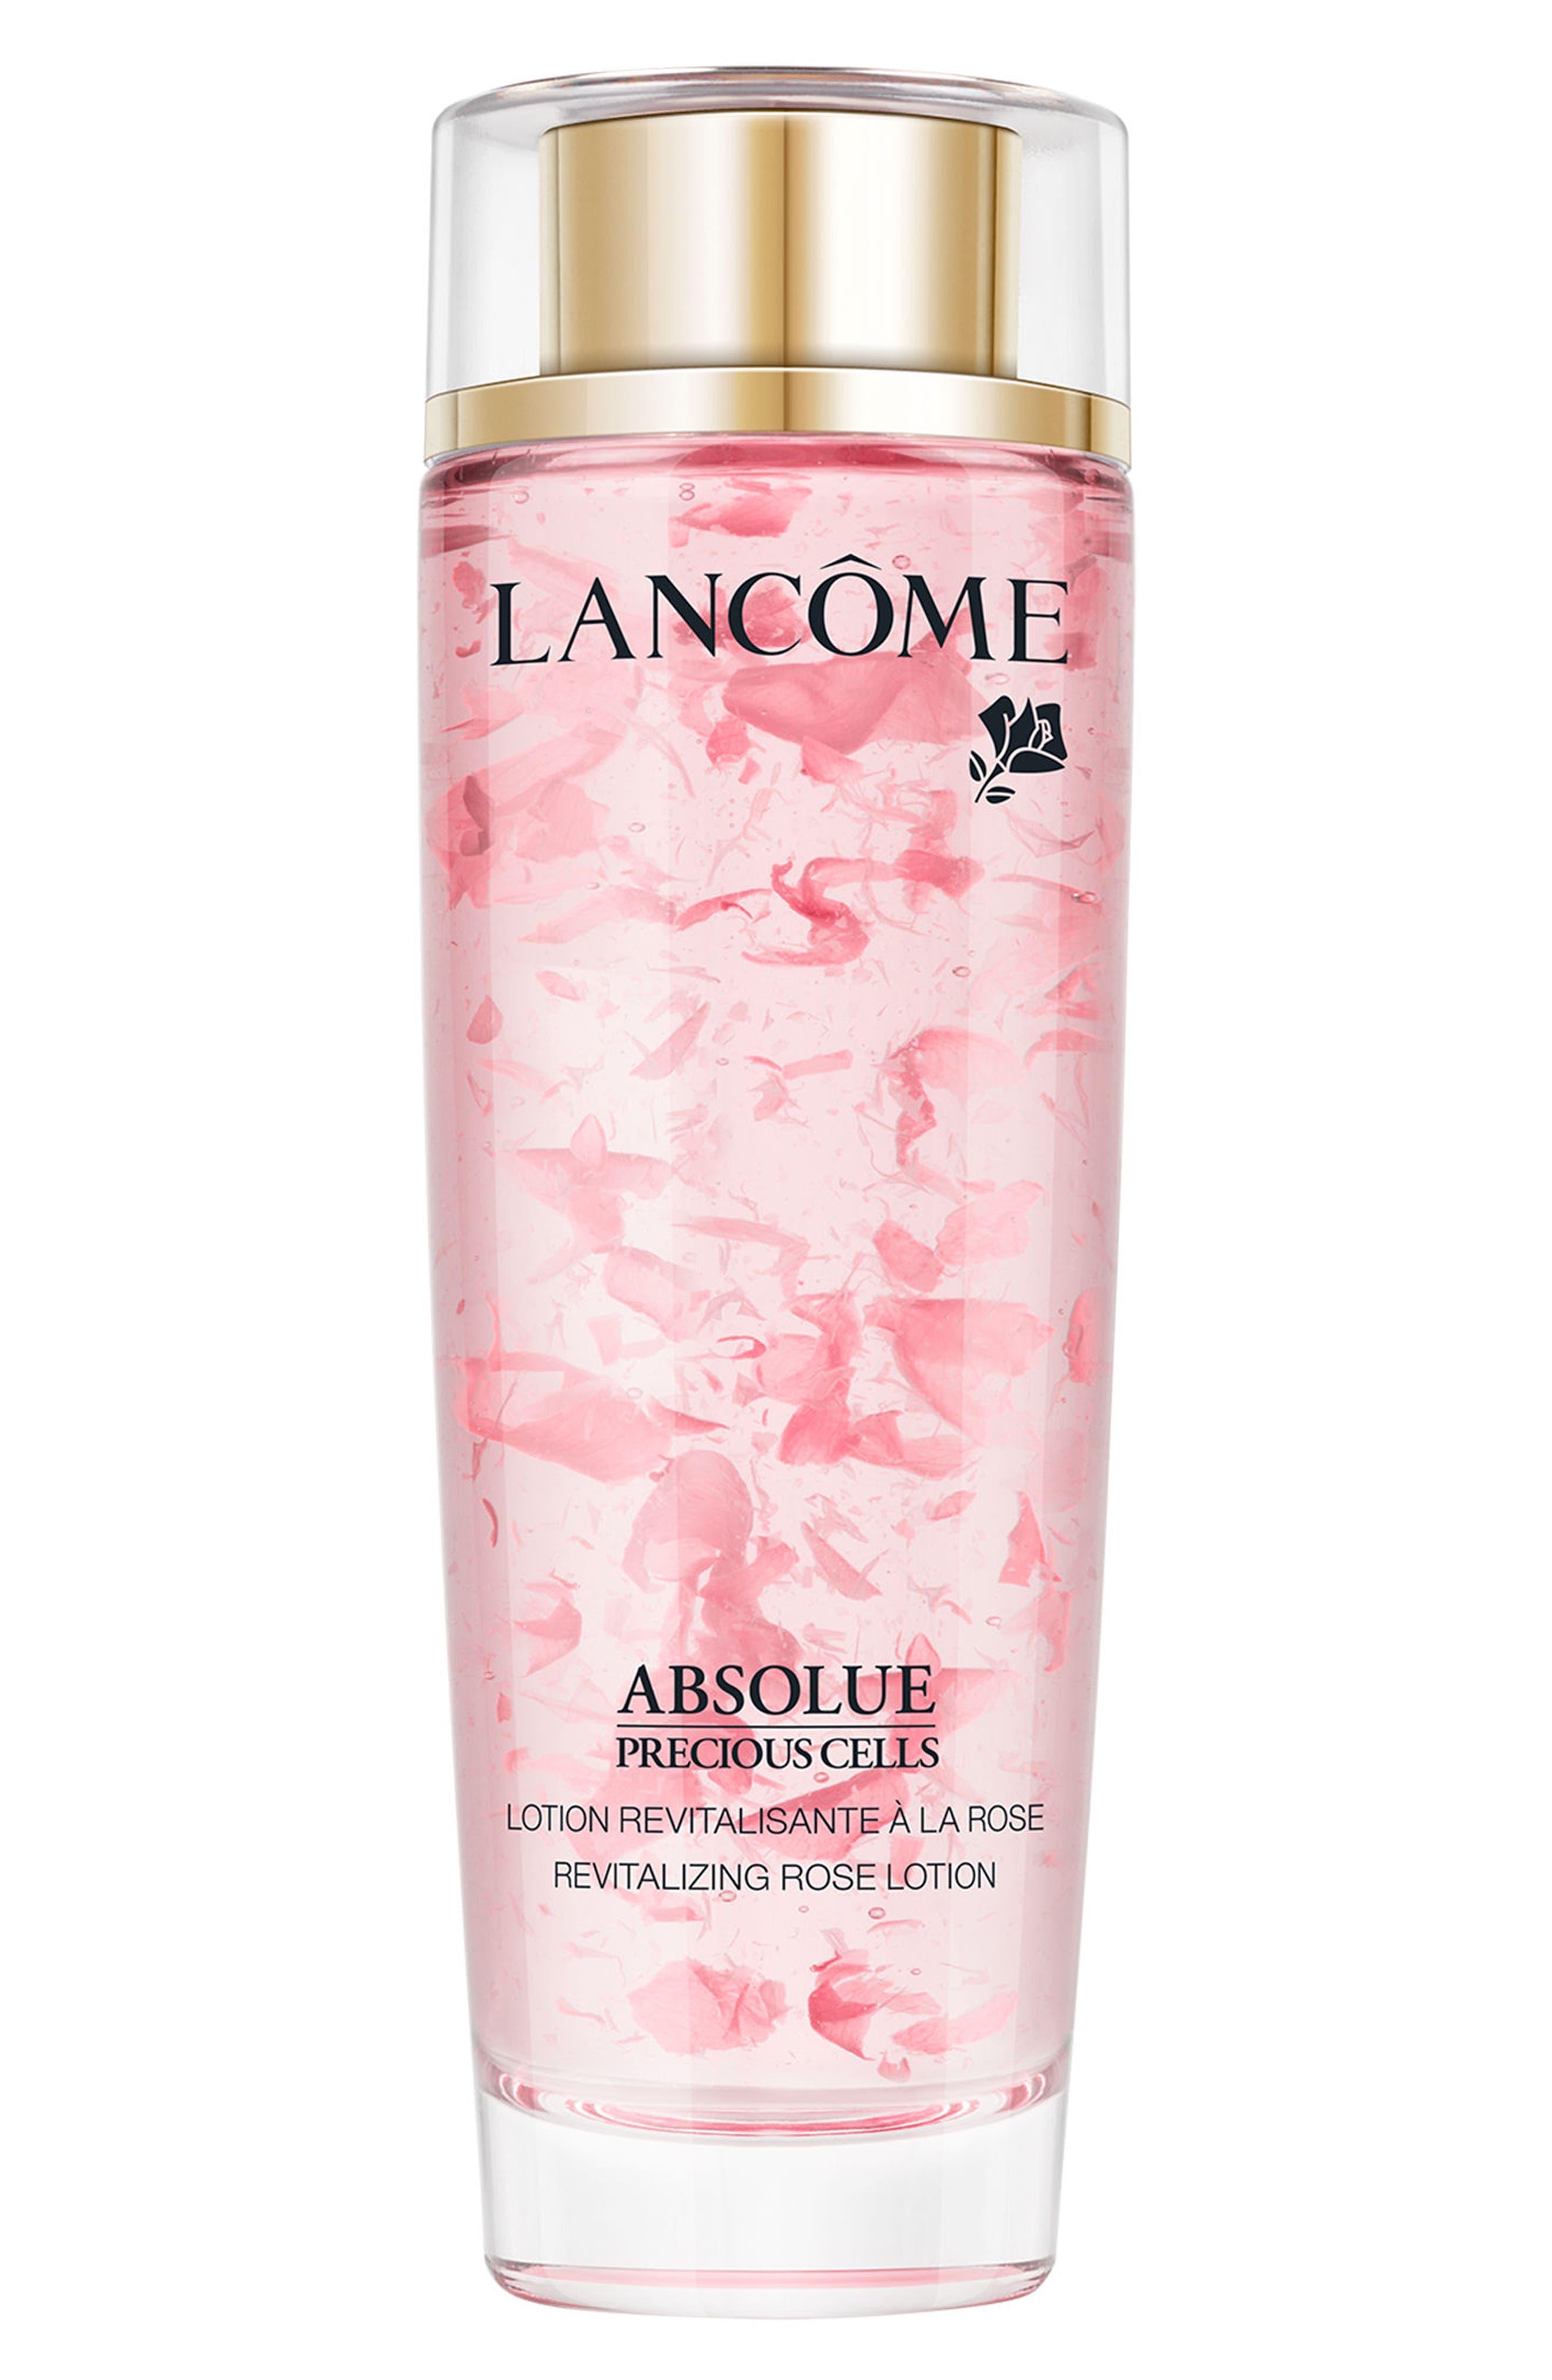 Lancôme Absolue Precious Cells Revitalizing Rose Lotion Toner